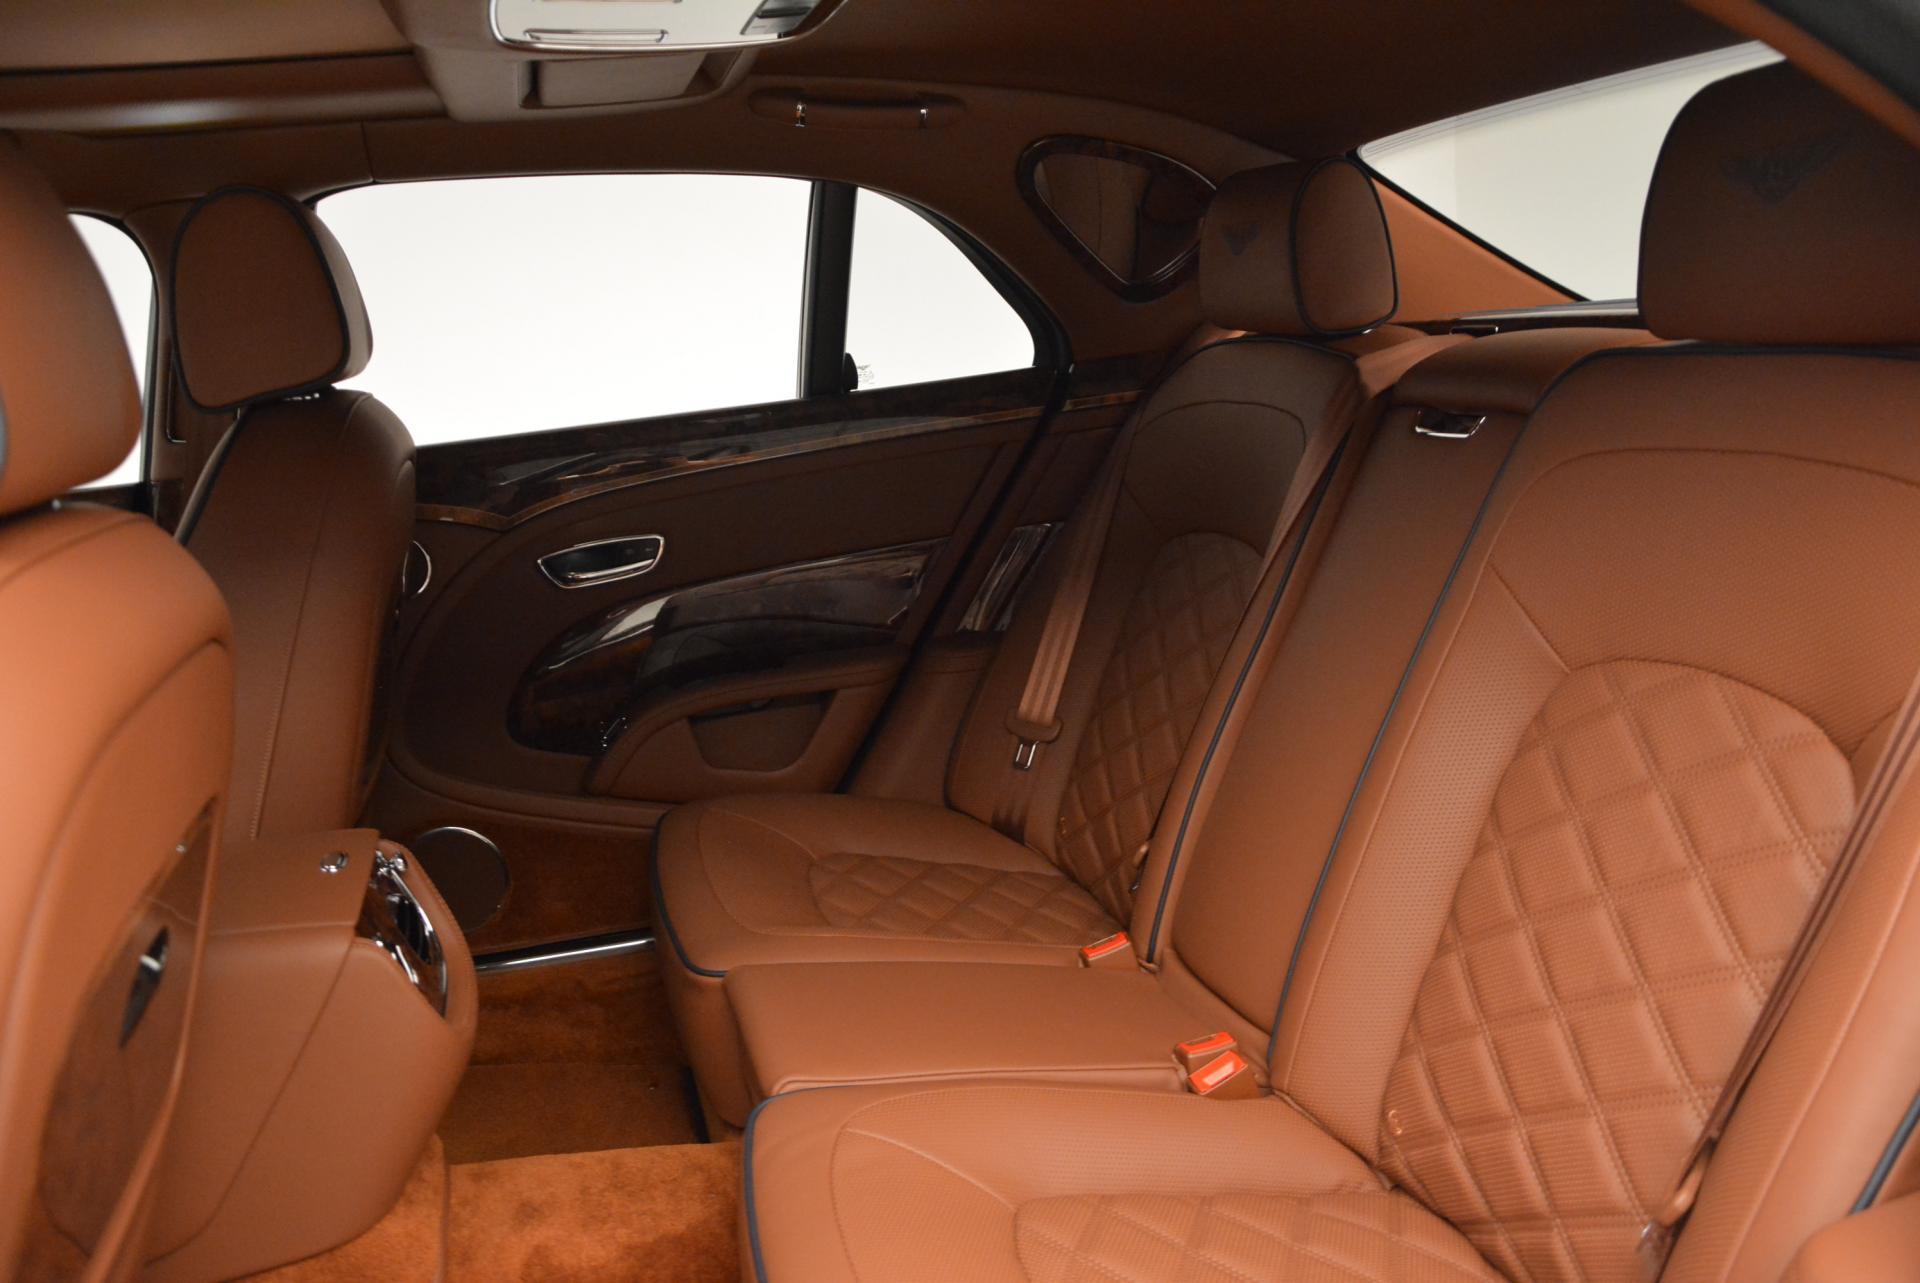 Used 2016 Bentley Mulsanne Speed For Sale In Westport, CT 31_p16